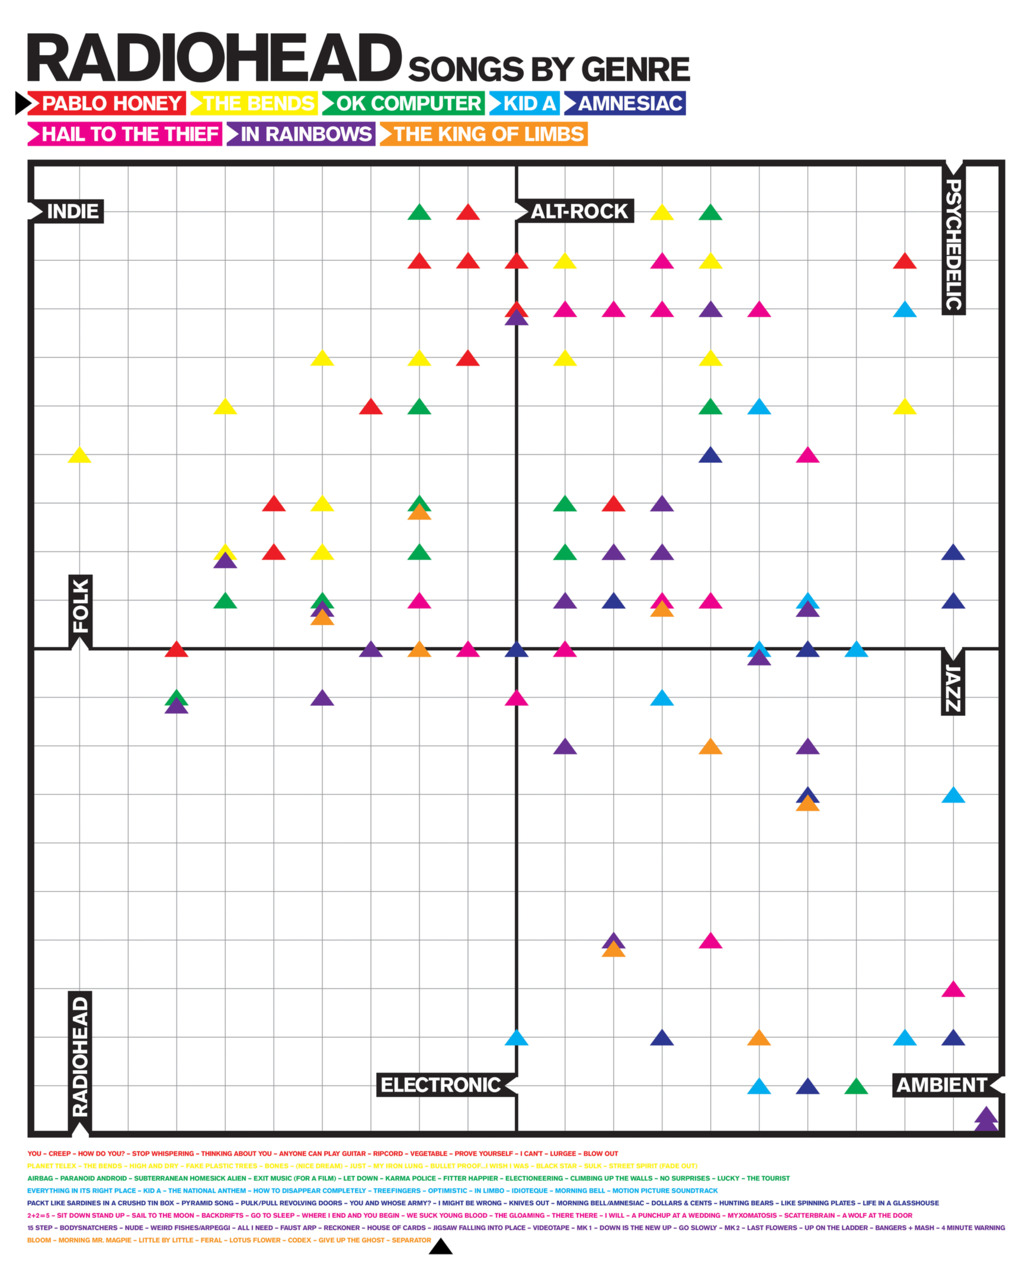 Radiohead Genre Chart